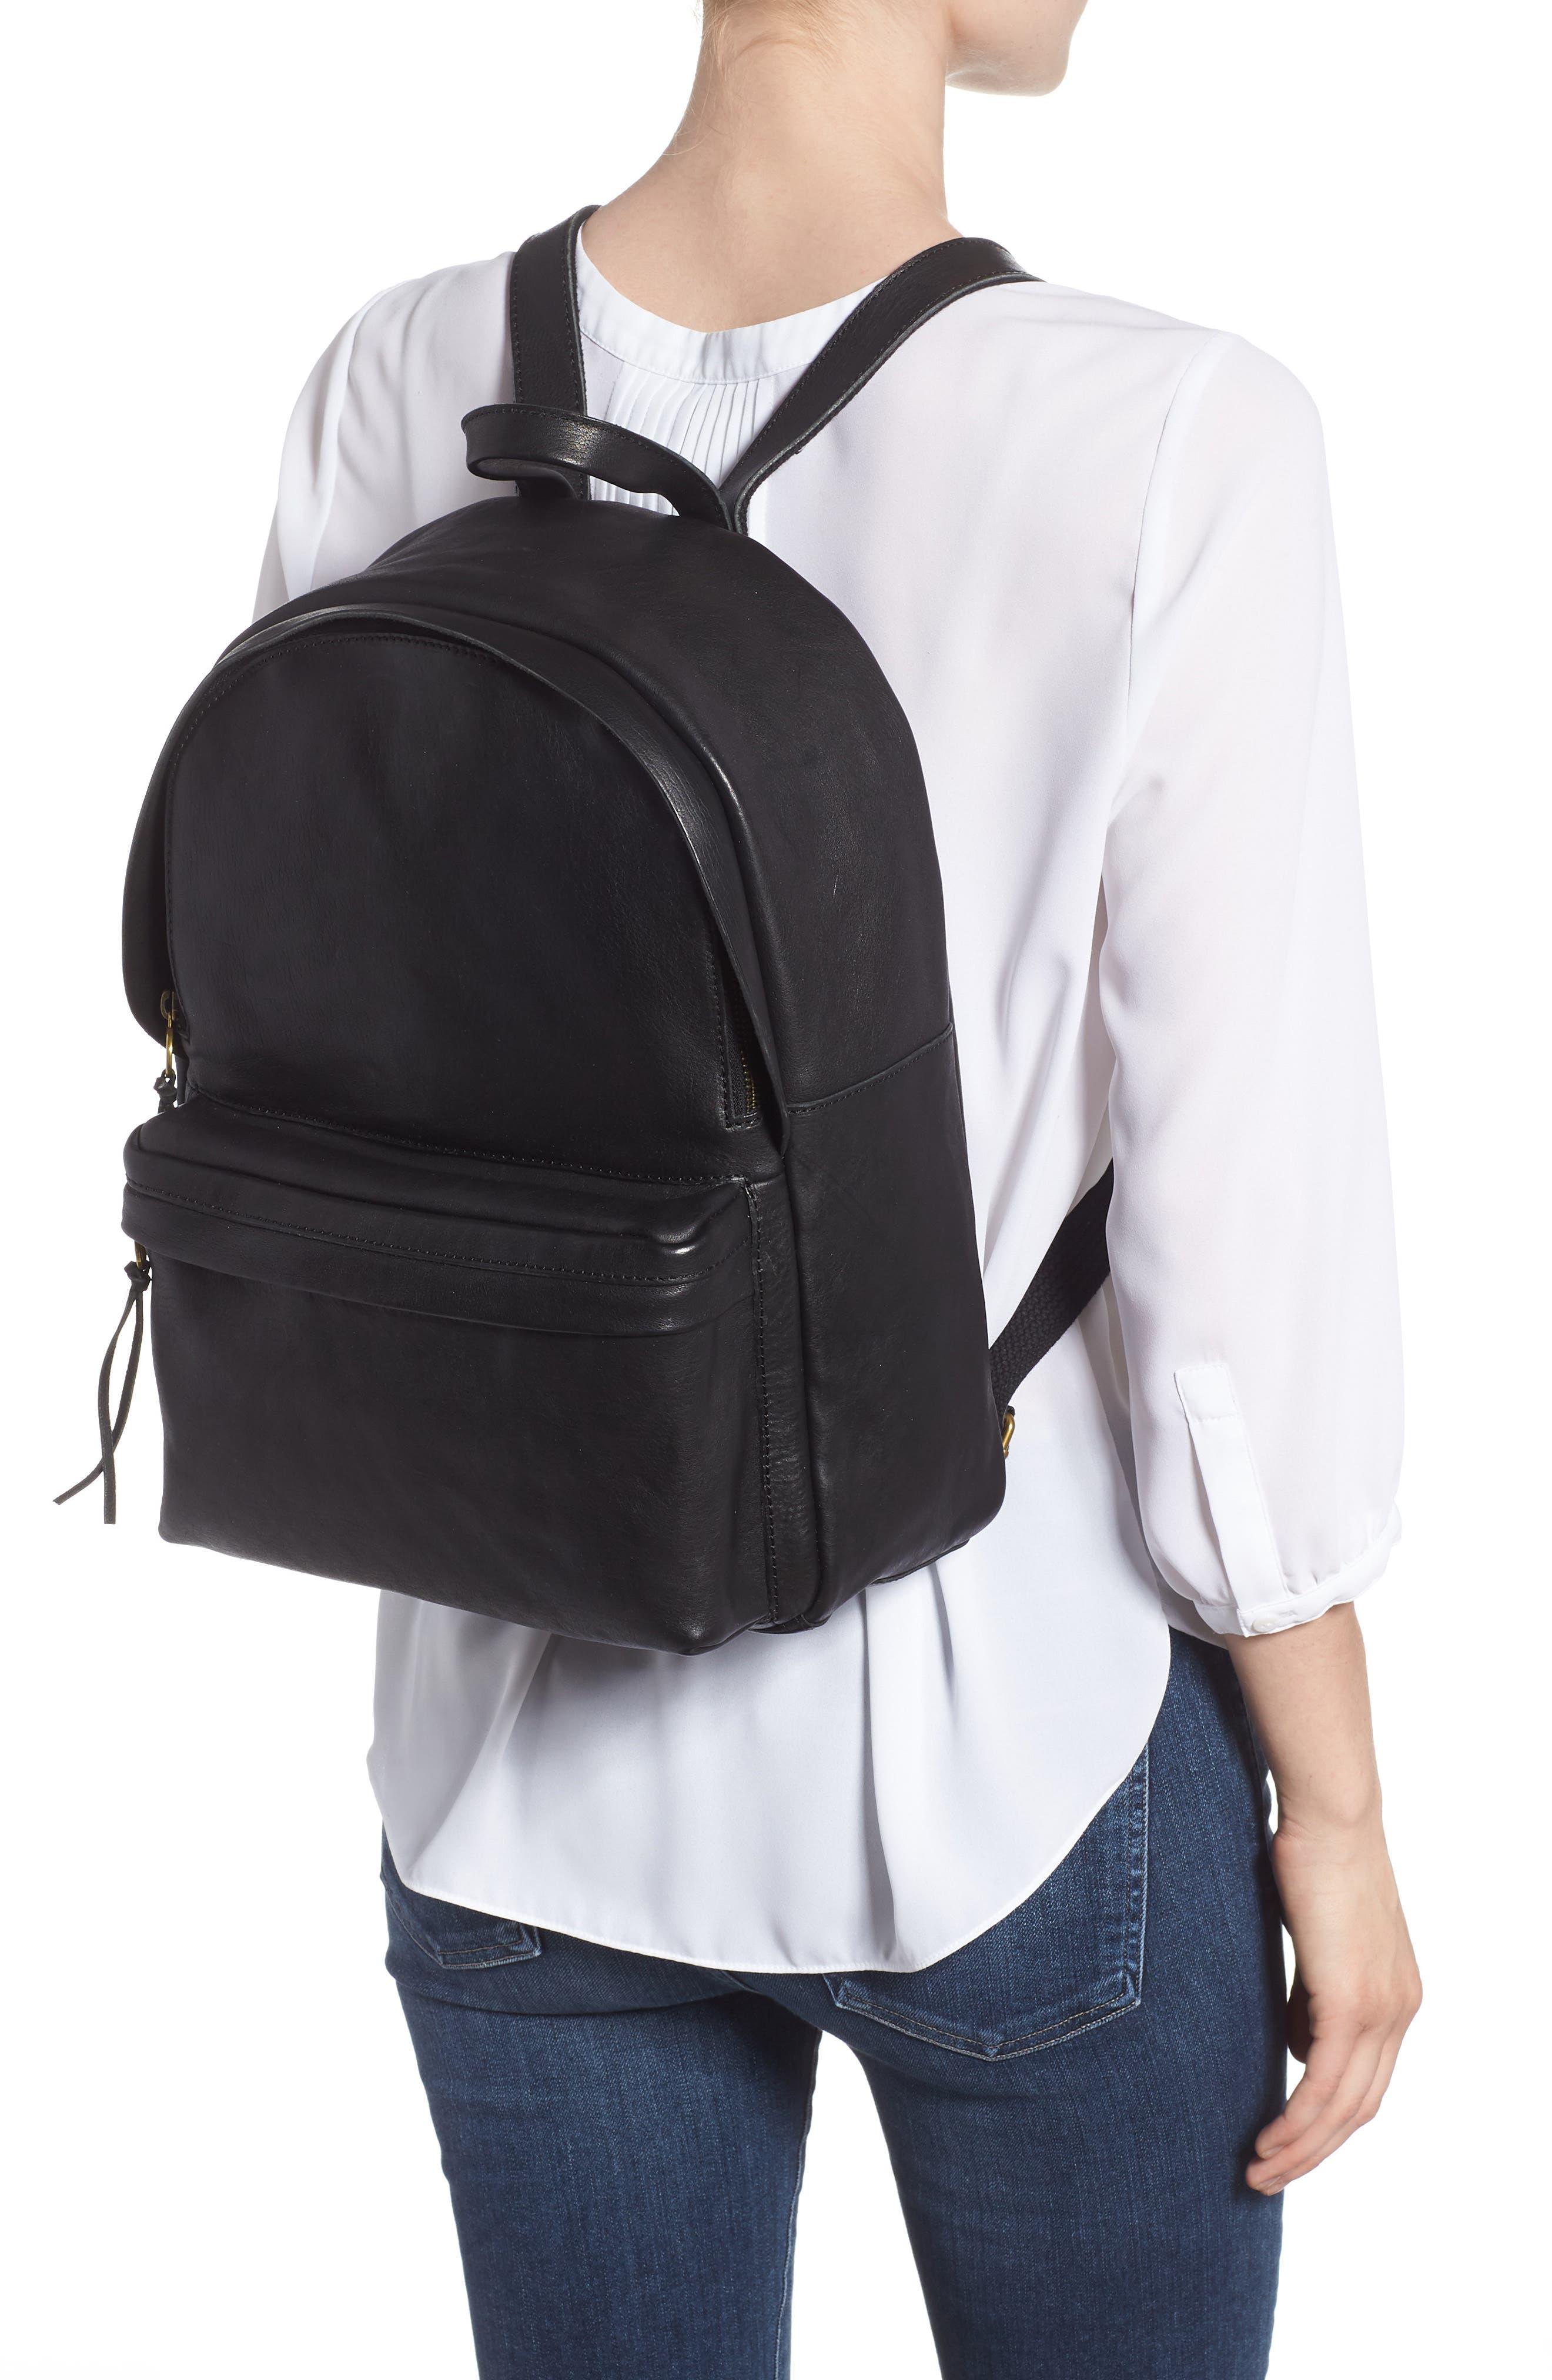 MADEWELL, Lorimer Leather Backpack, Alternate thumbnail 2, color, TRUE BLACK